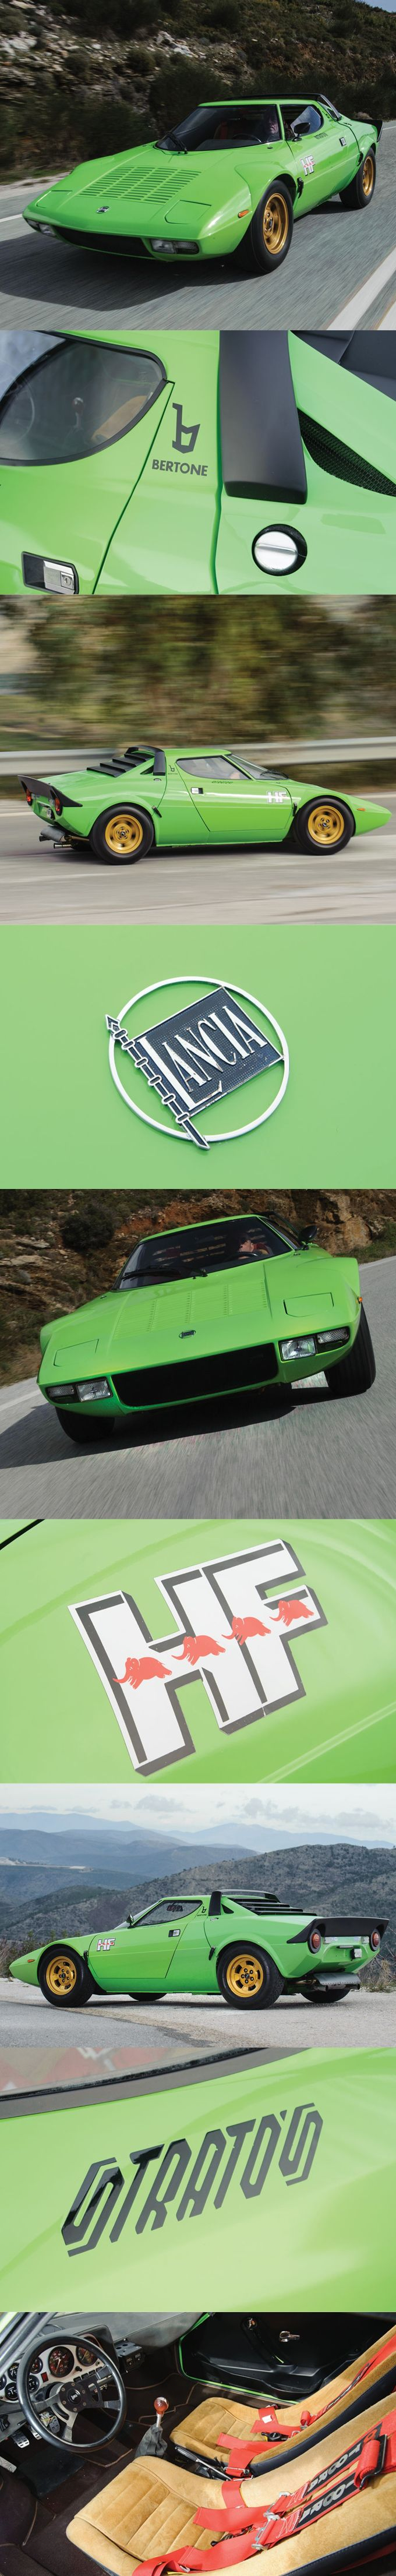 1973 Lancia Stratos HF Stradale / Marcello Gandini at Bertone / 192hp Dino V6 / 492pcs / Italy / green